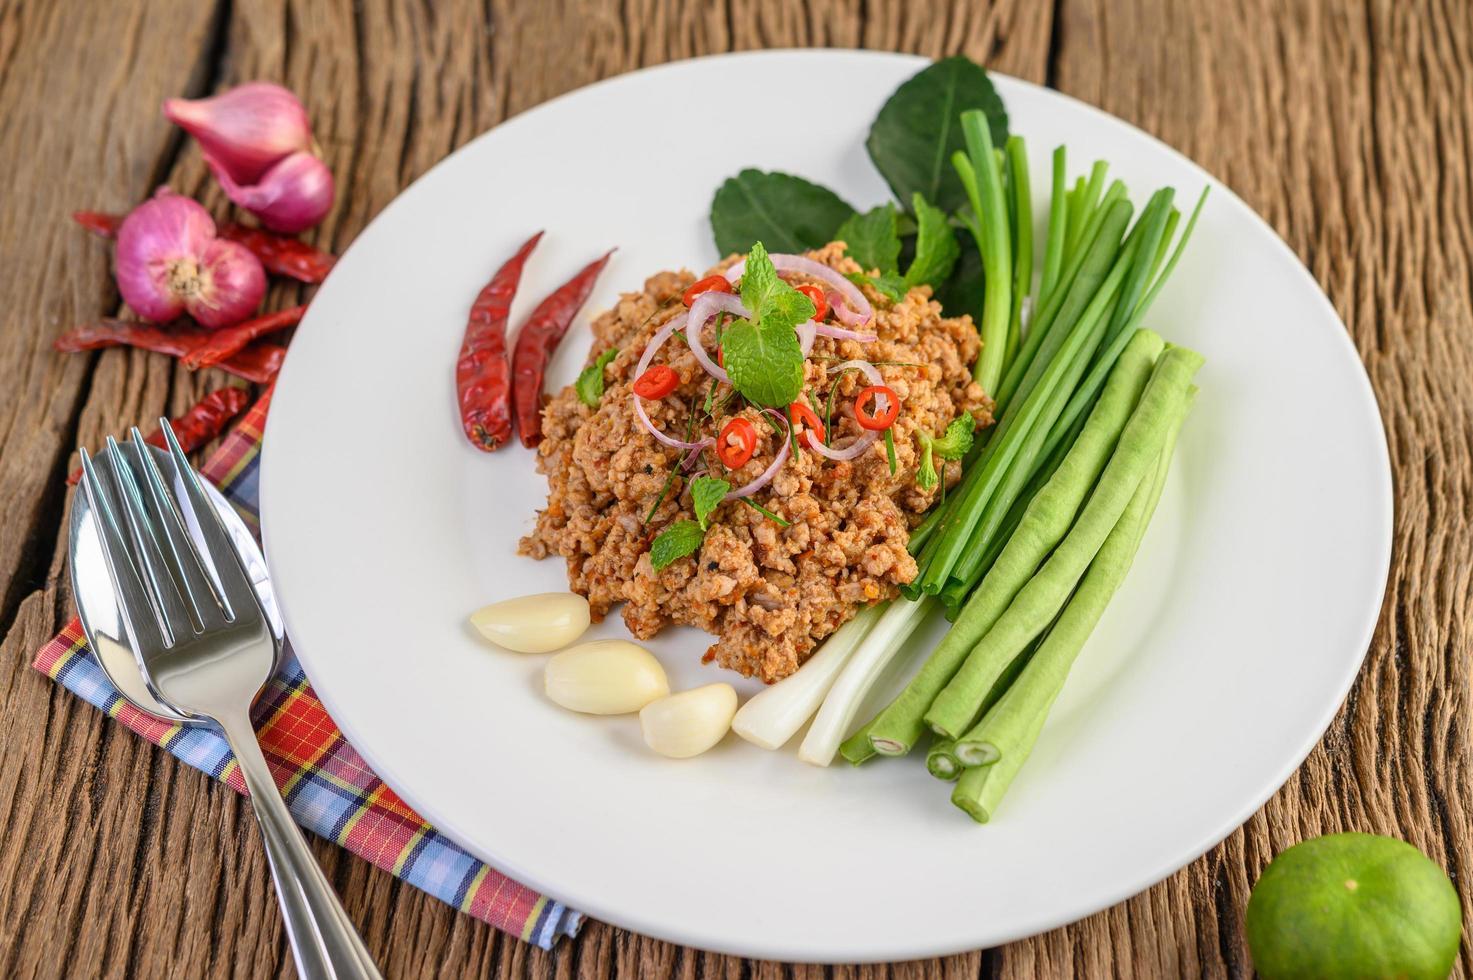 insalata di maiale macinata piccante su verdure verdi foto